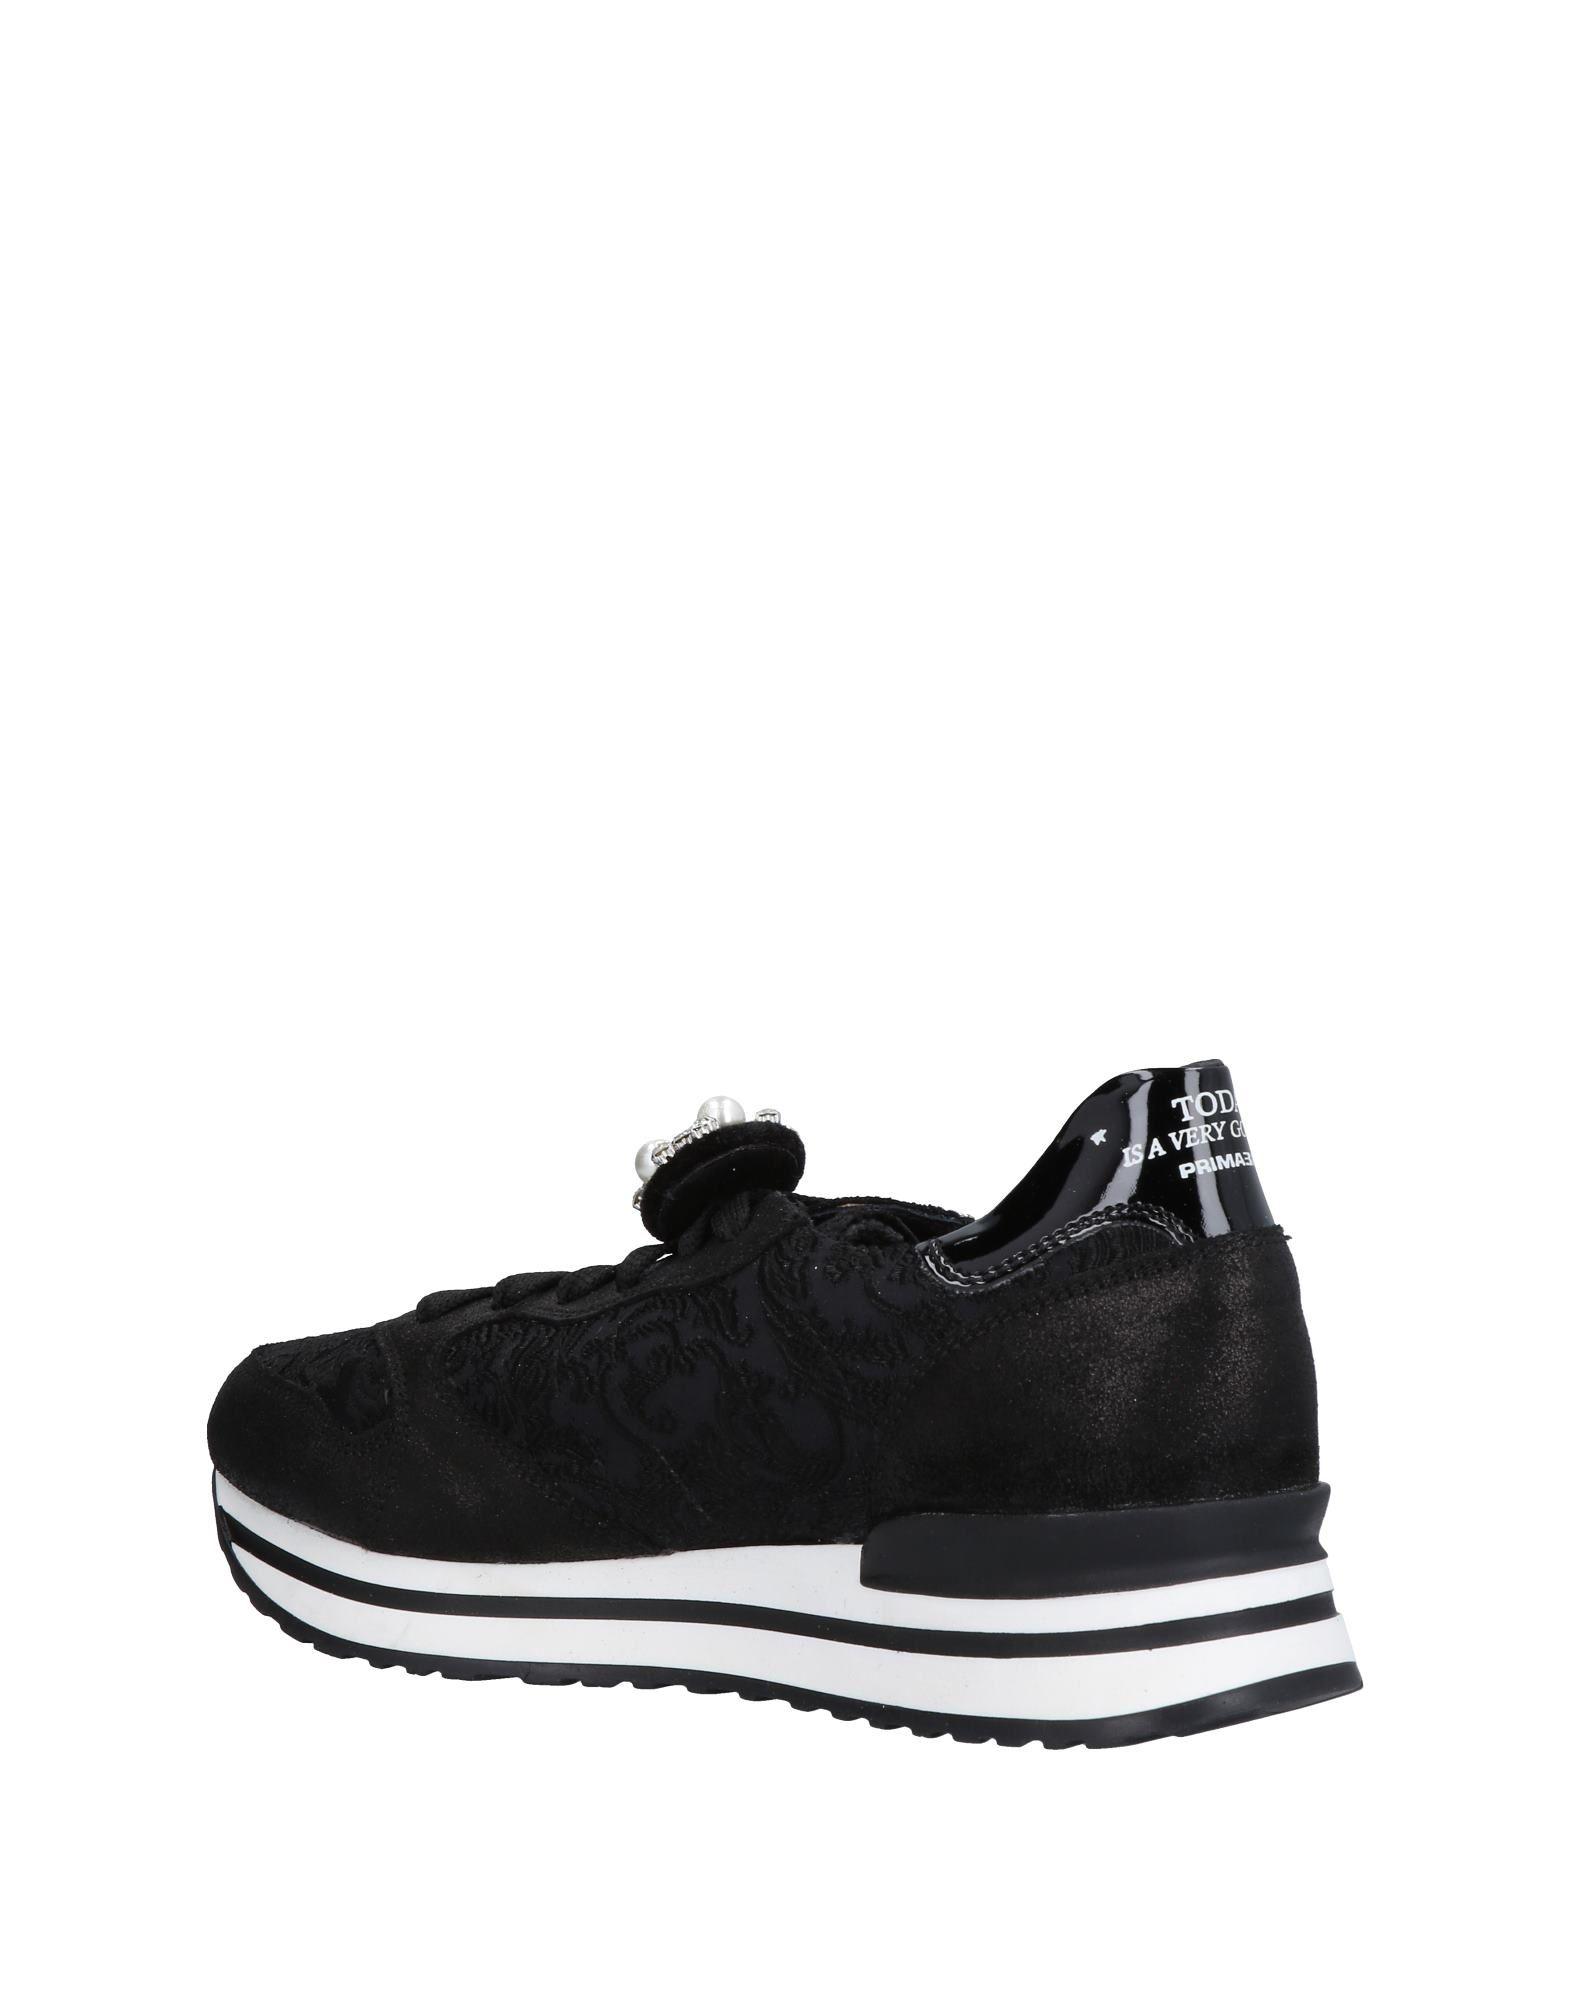 Stilvolle billige Schuhe Primabase Sneakers 11474024HR Damen  11474024HR Sneakers 1754df